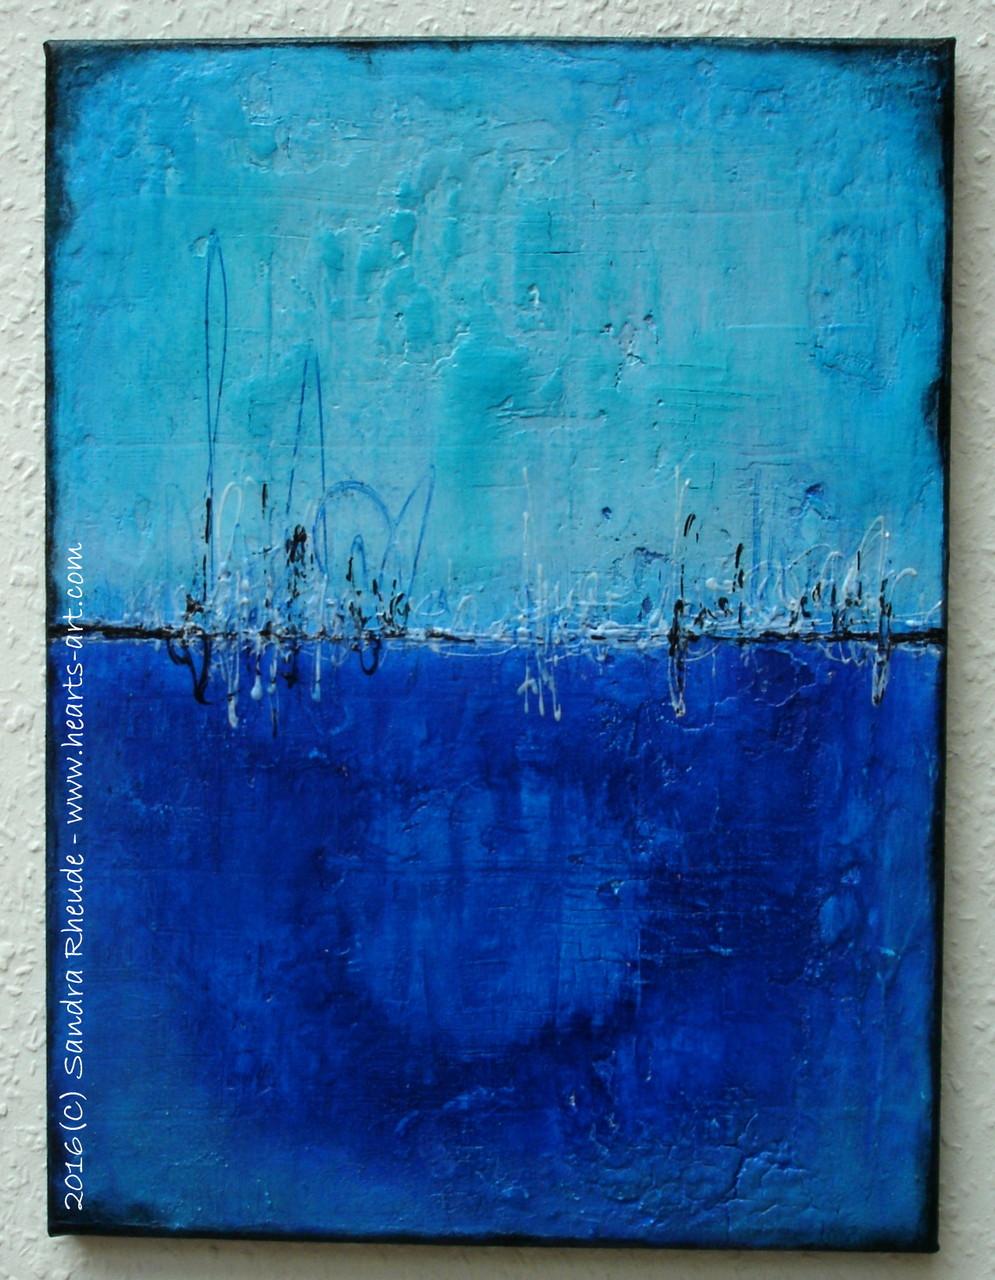 'Deep Blue' -  2016/18 - Acryl/MixedMedia auf Leinwand - 30 x 40 cm - € 220